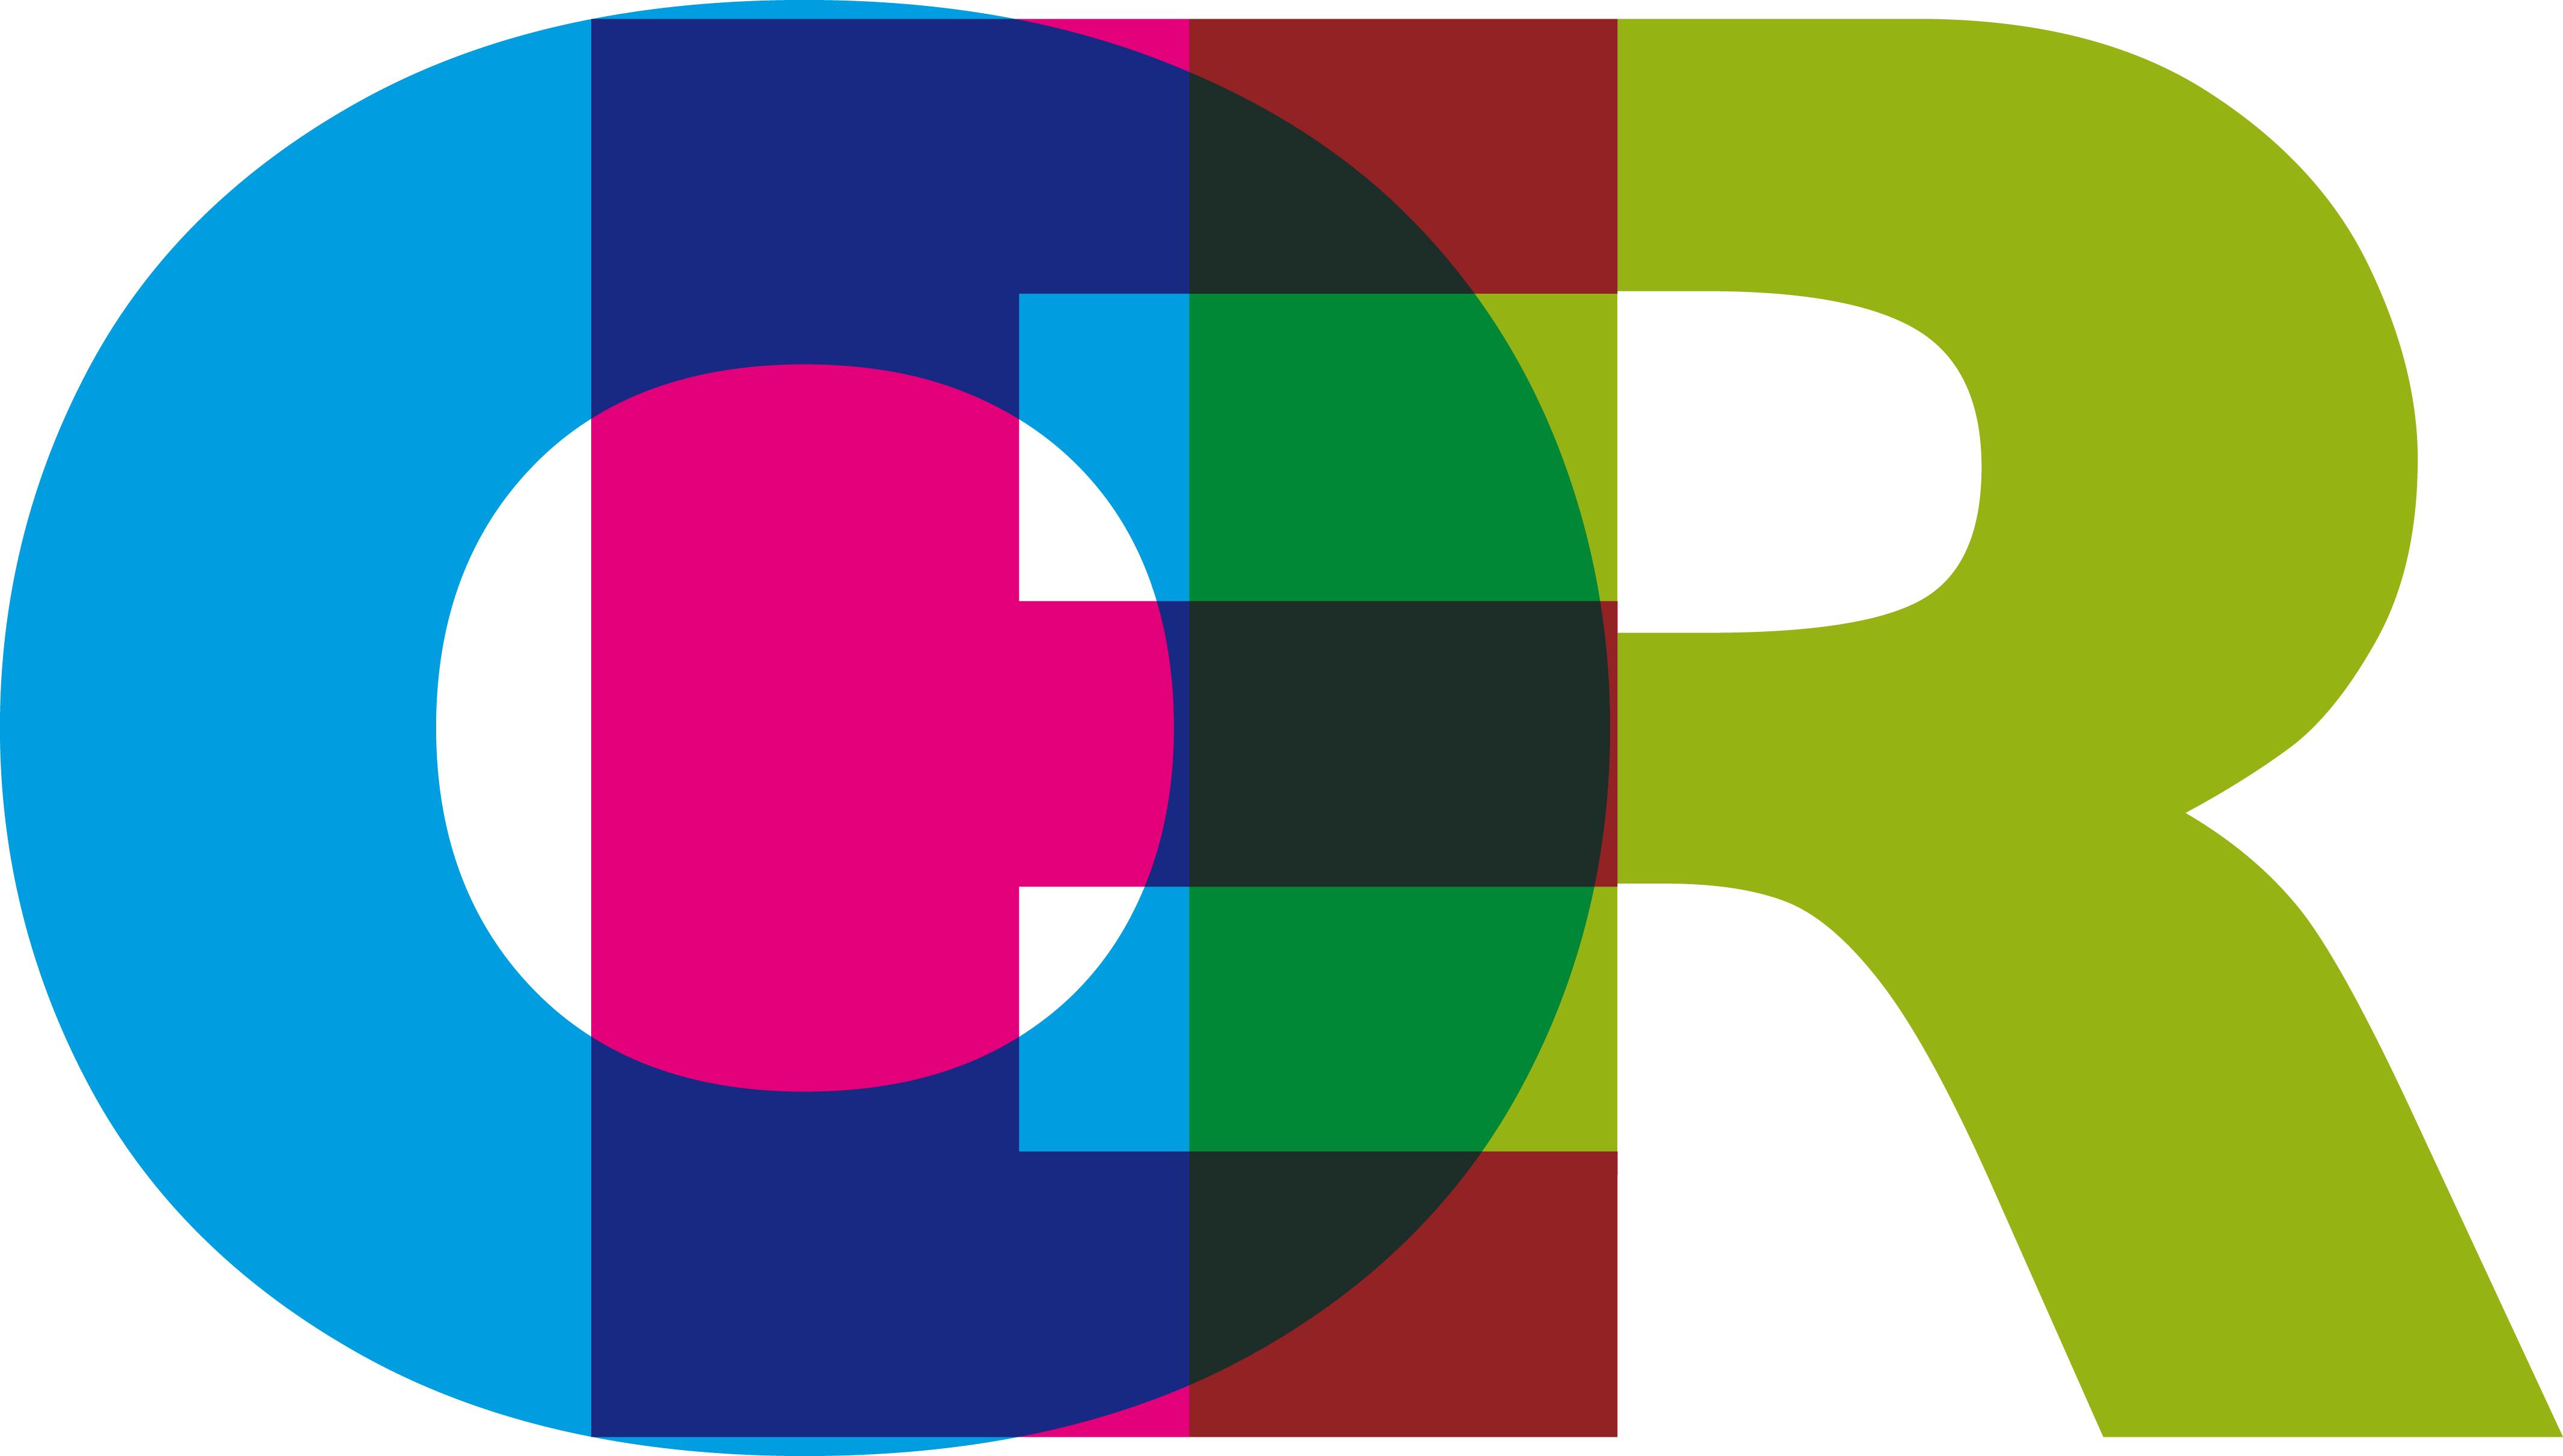 File:OER-Programm-Logo.jpg - Wikimedia Commons